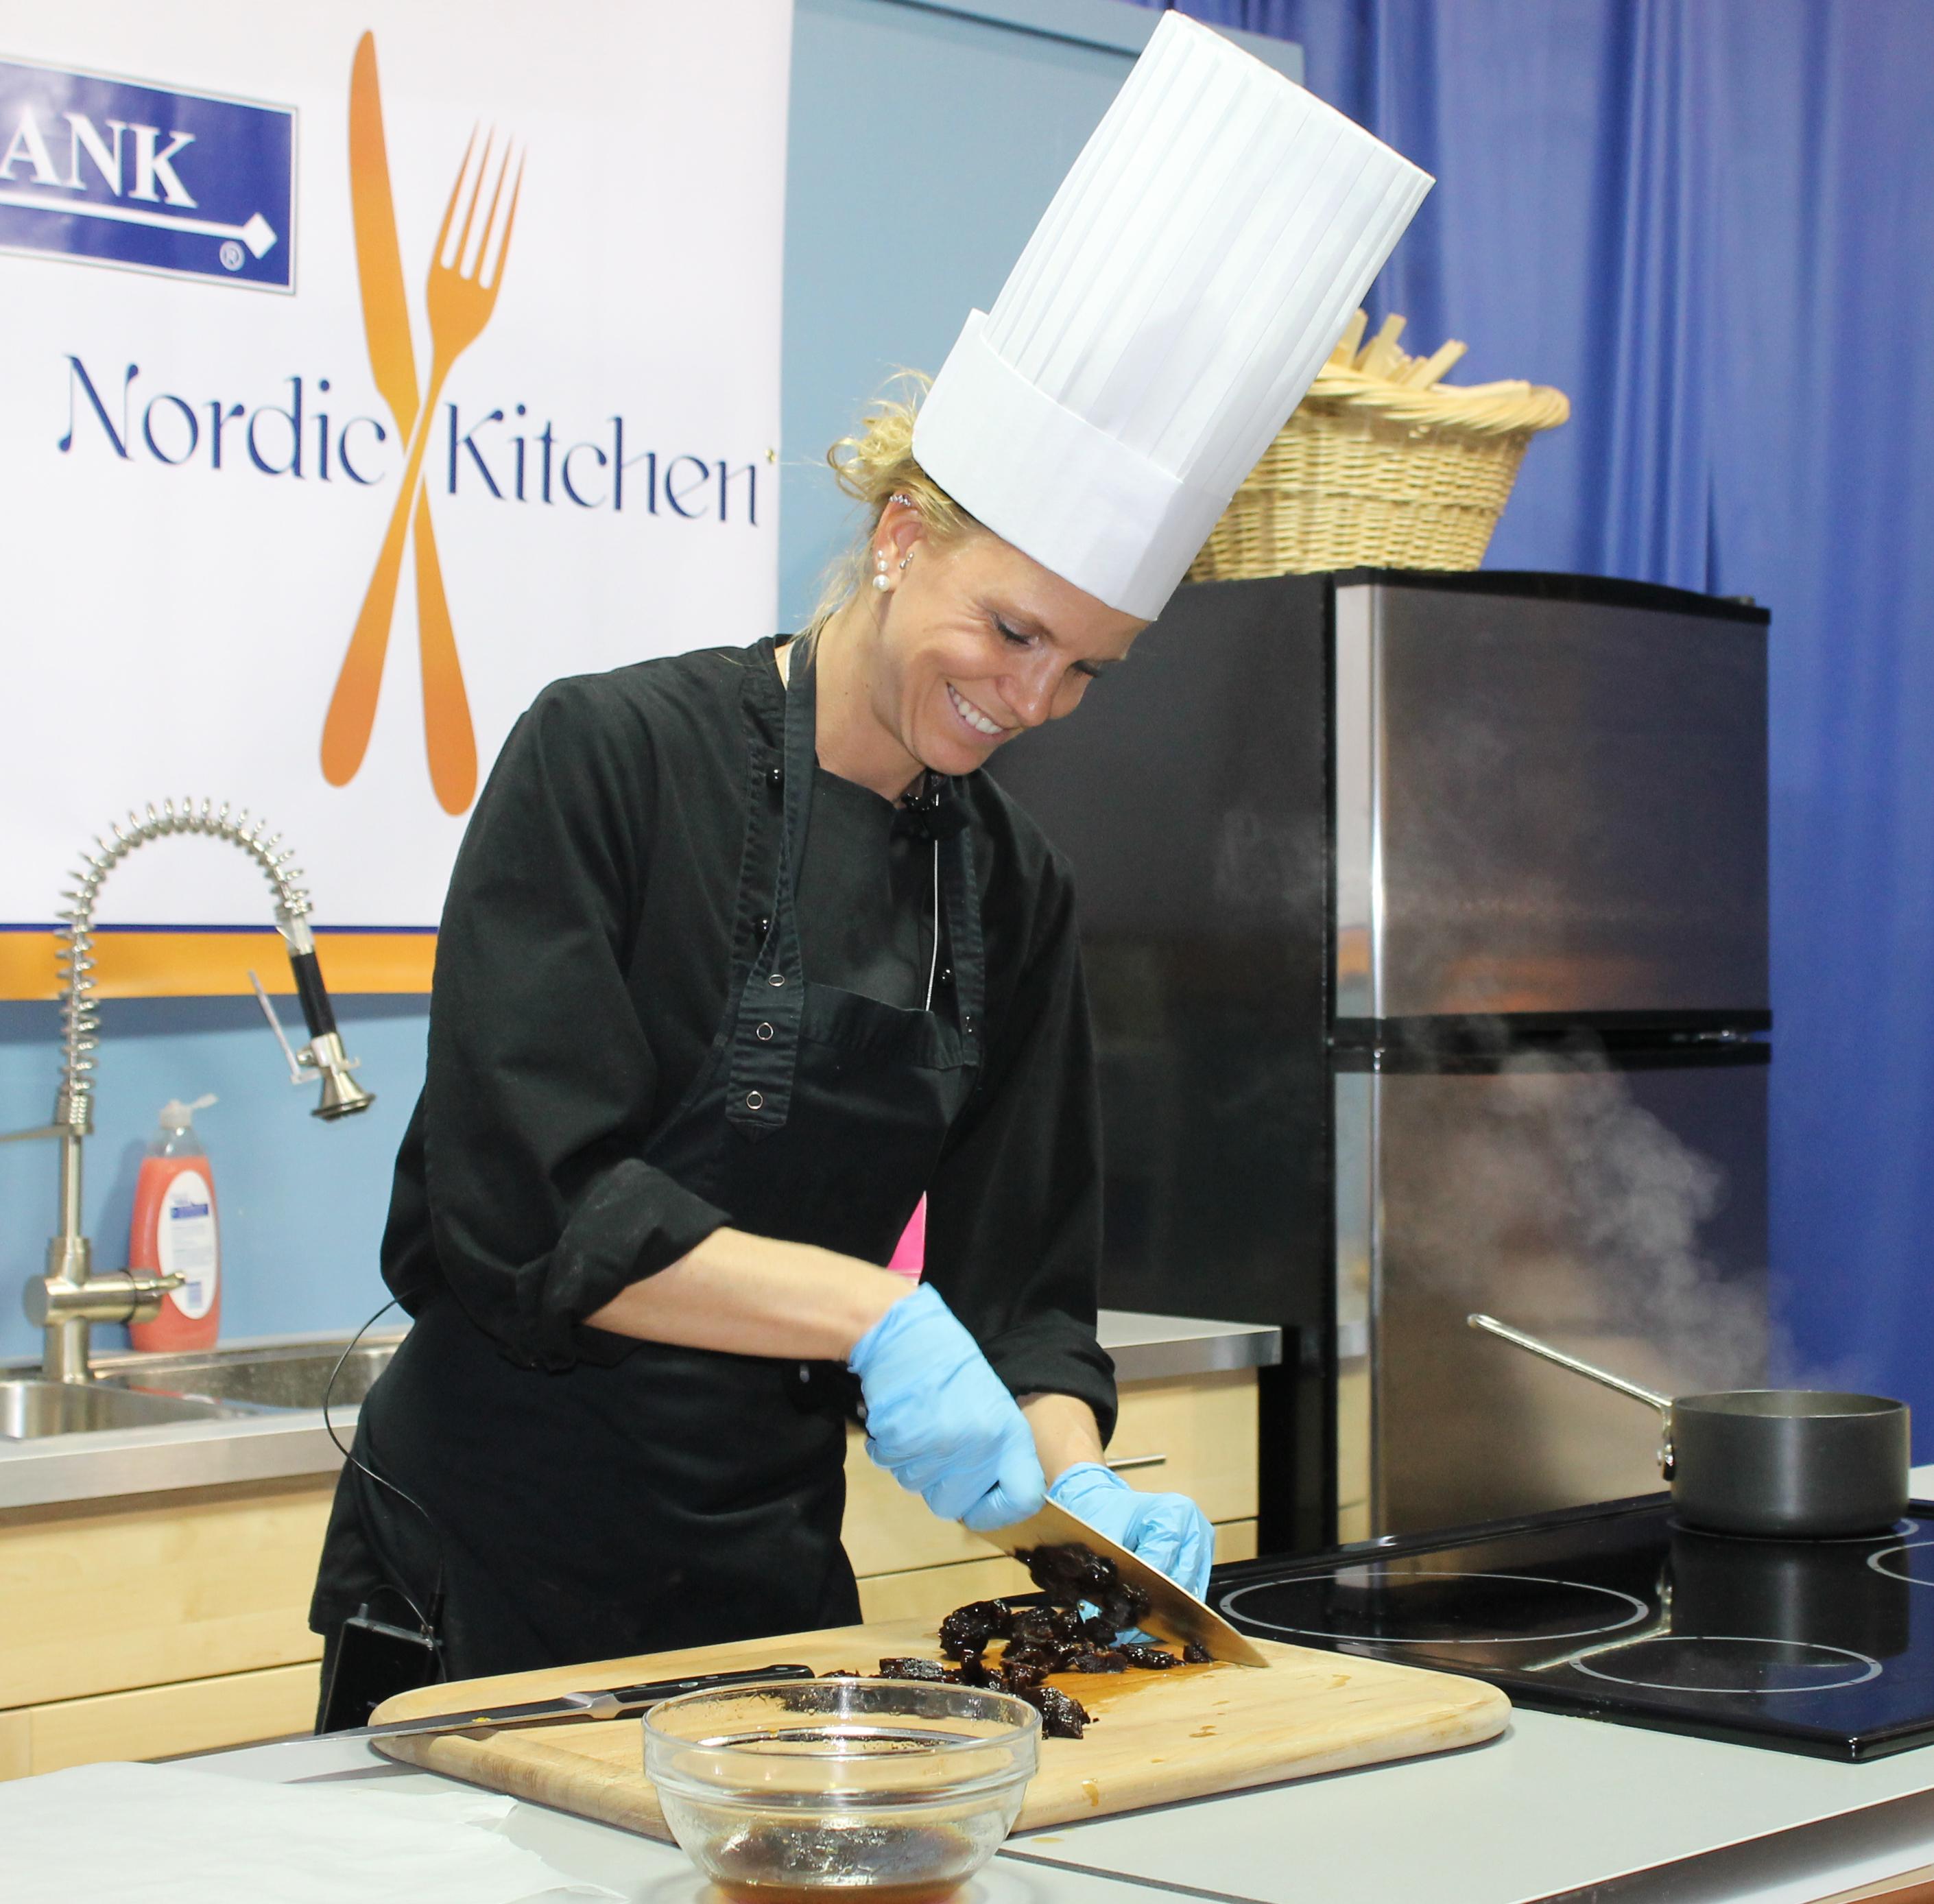 Nordic Kitchen at Hostfest